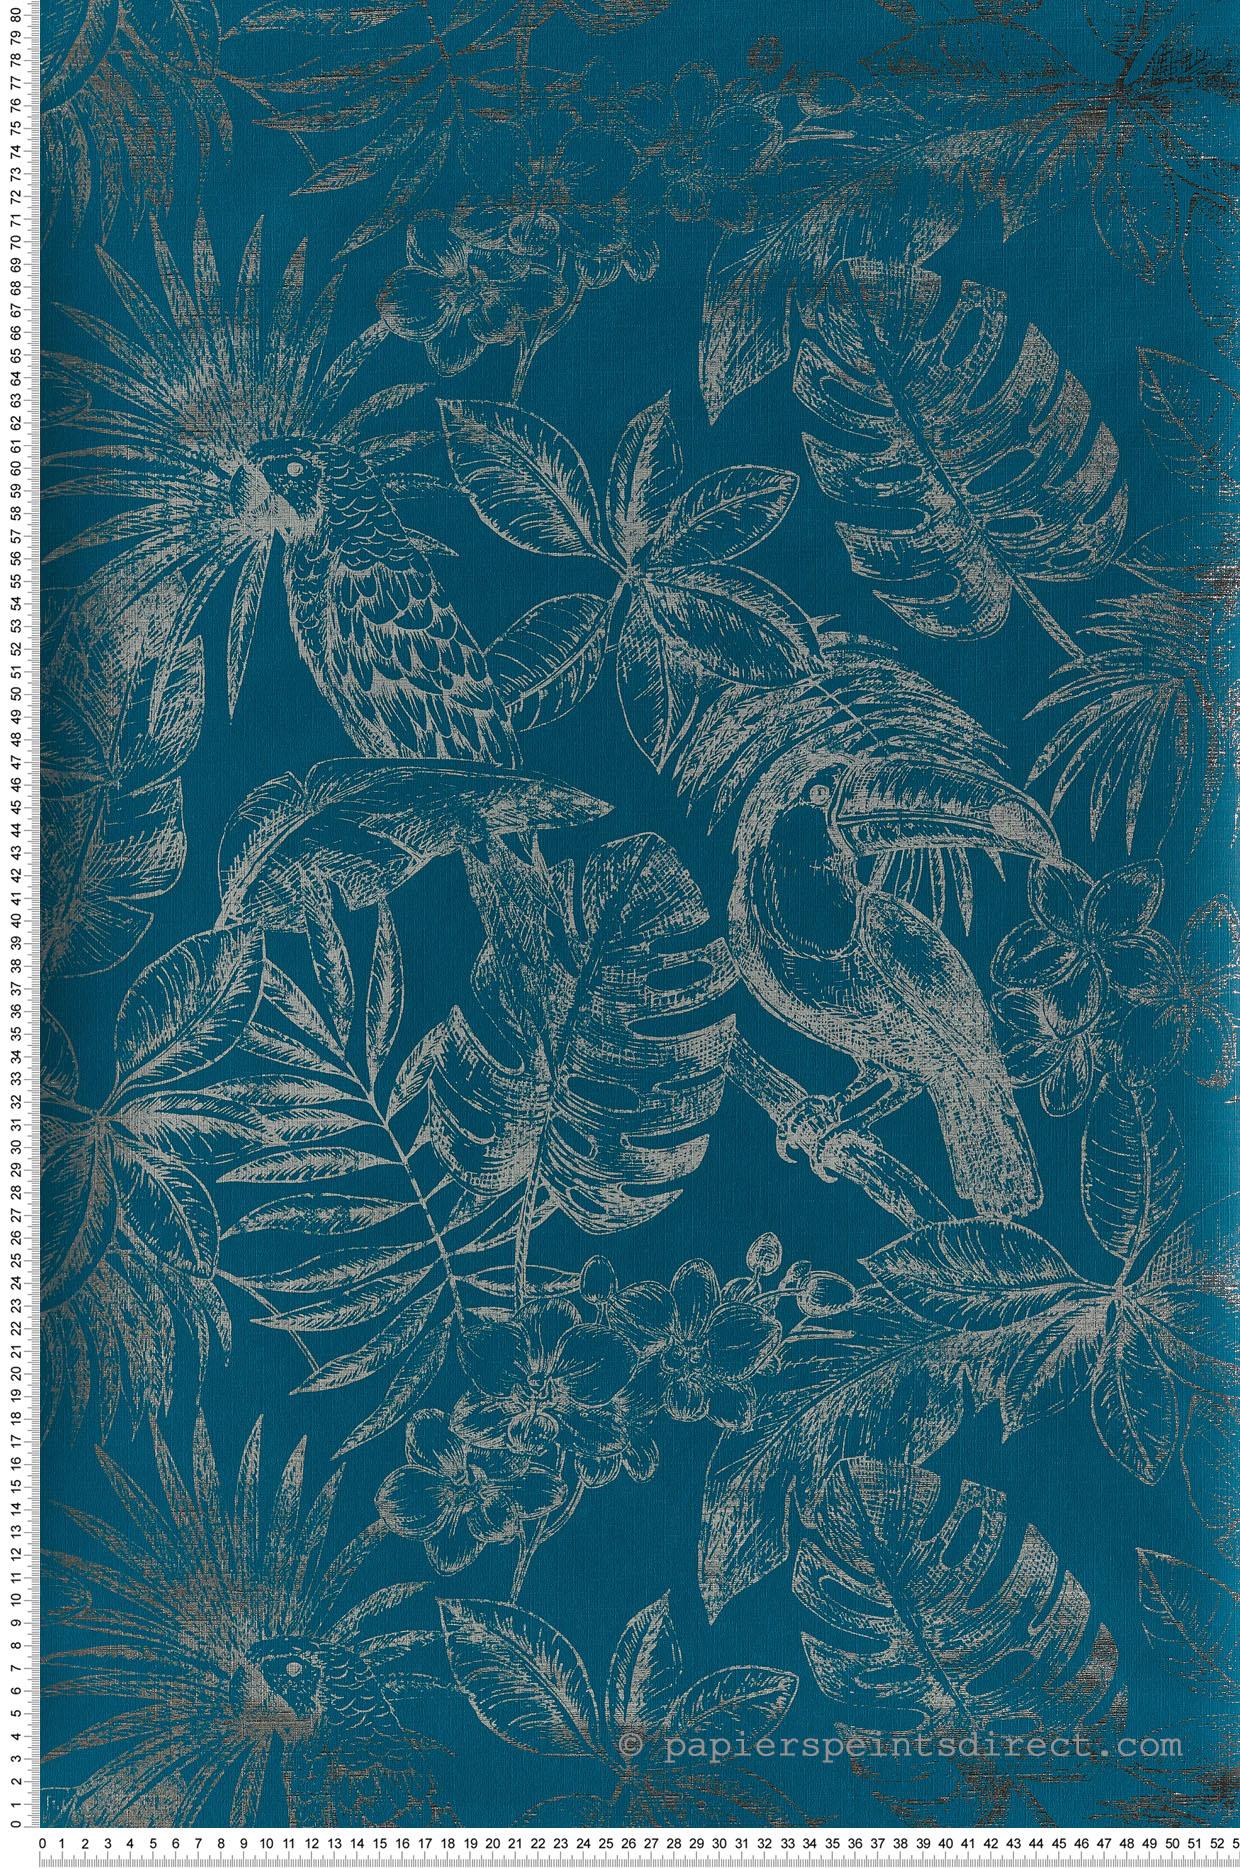 Papier Peint Avec Perroquet papier peint jungle toucan métallisé bleu canard - escapade